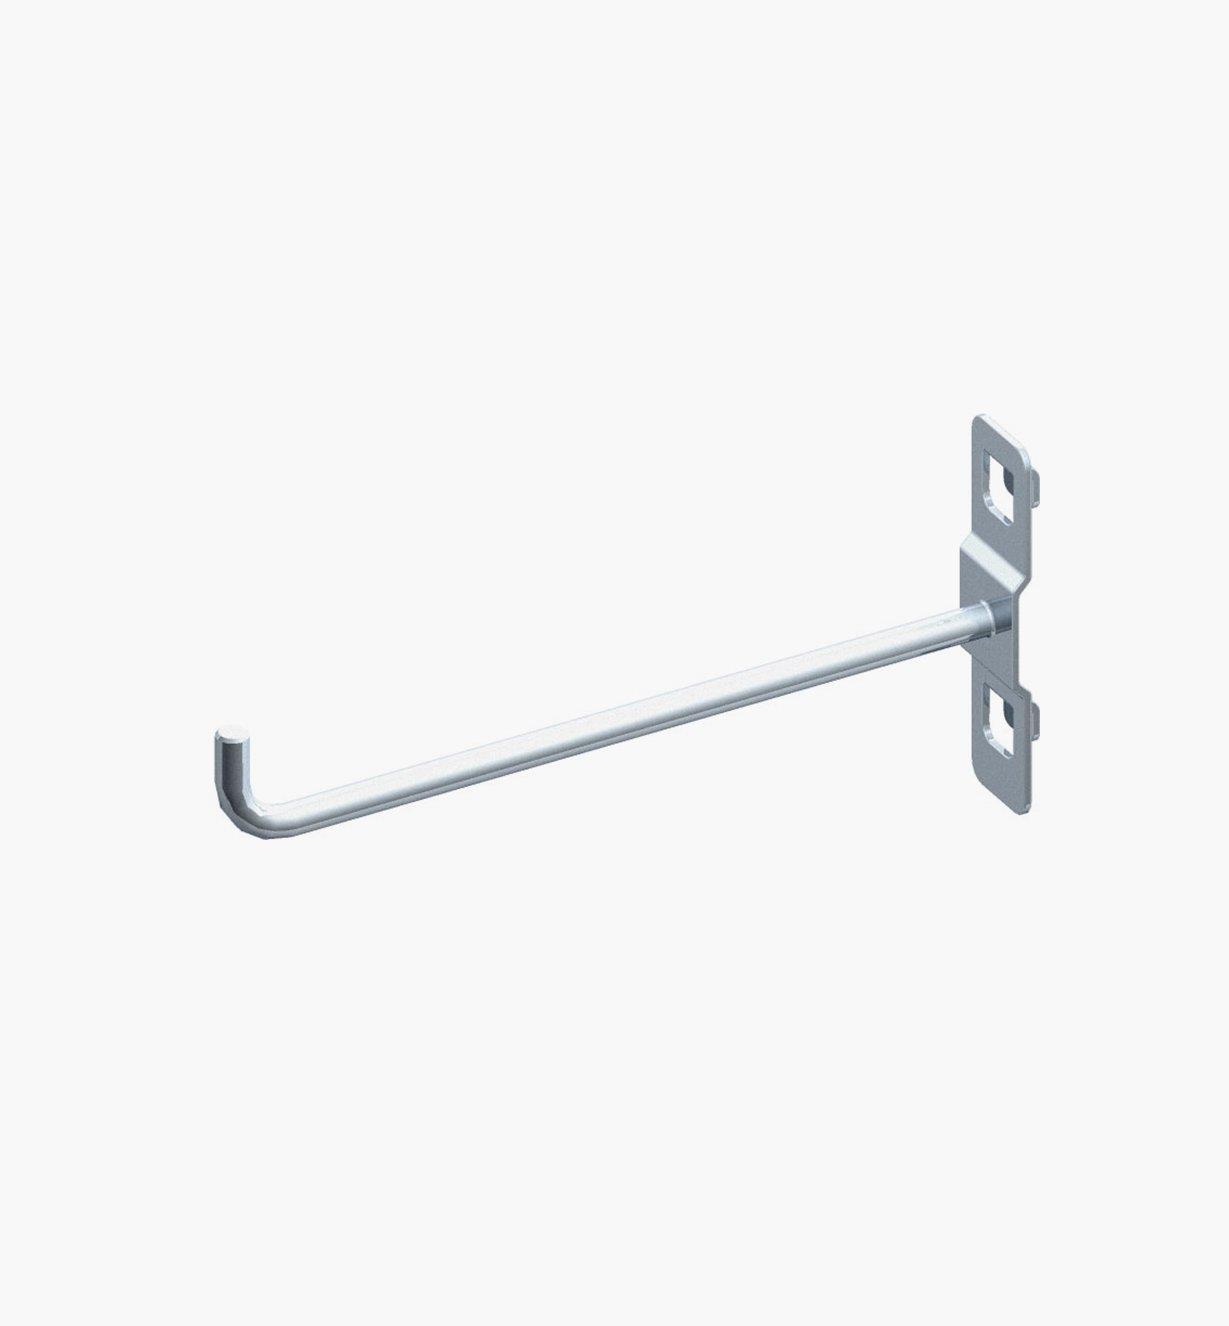 ZA497475 - Single Prong Hooks